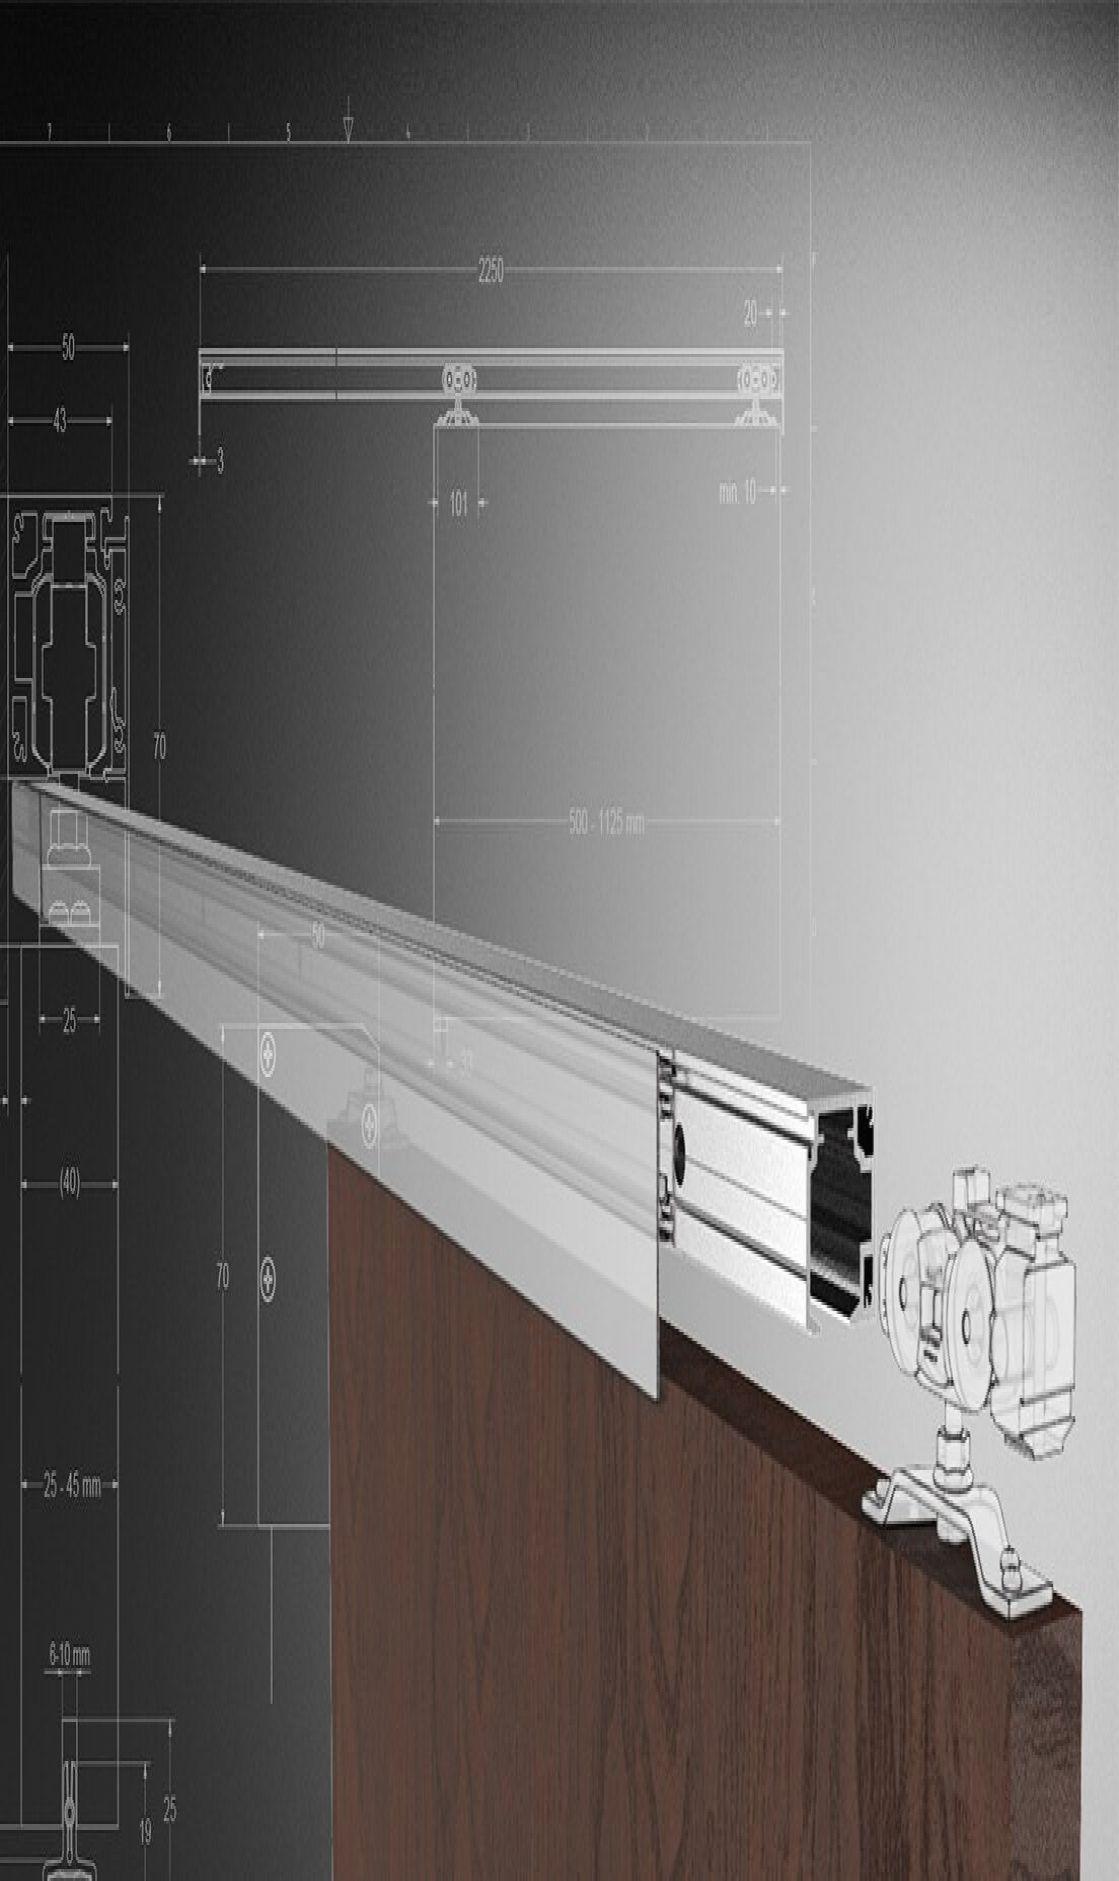 22 Cool Schrank Schiebeturen Schienensystem In 2020 Bathroom